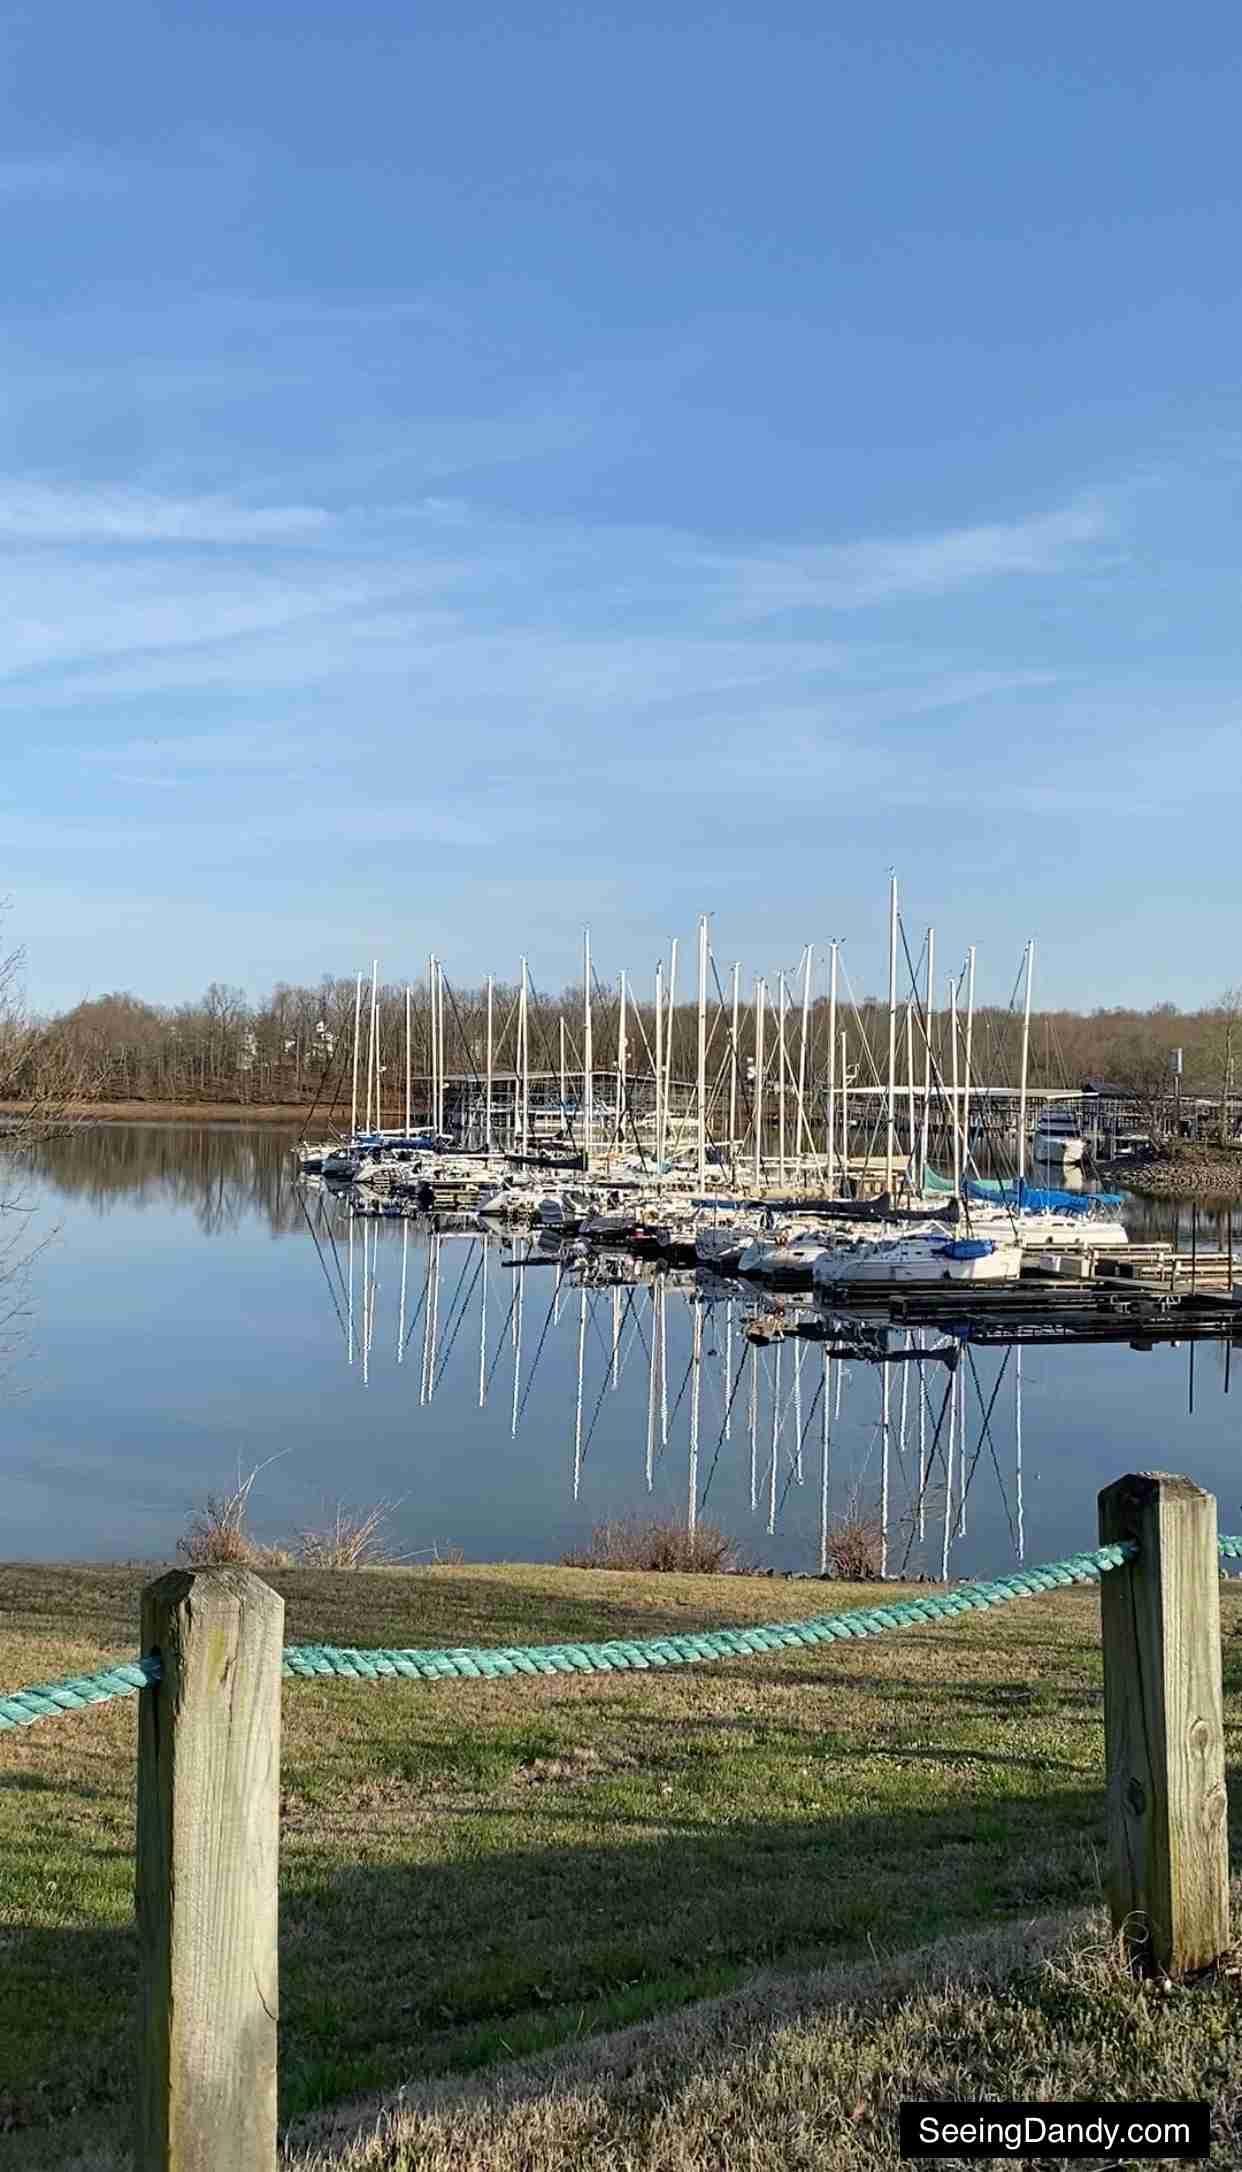 yacht club, yachts, lake barkley, kentucky spring break, green turtle bay resort, grand rivers kentucky, kentucky national recreation area, yacht marina